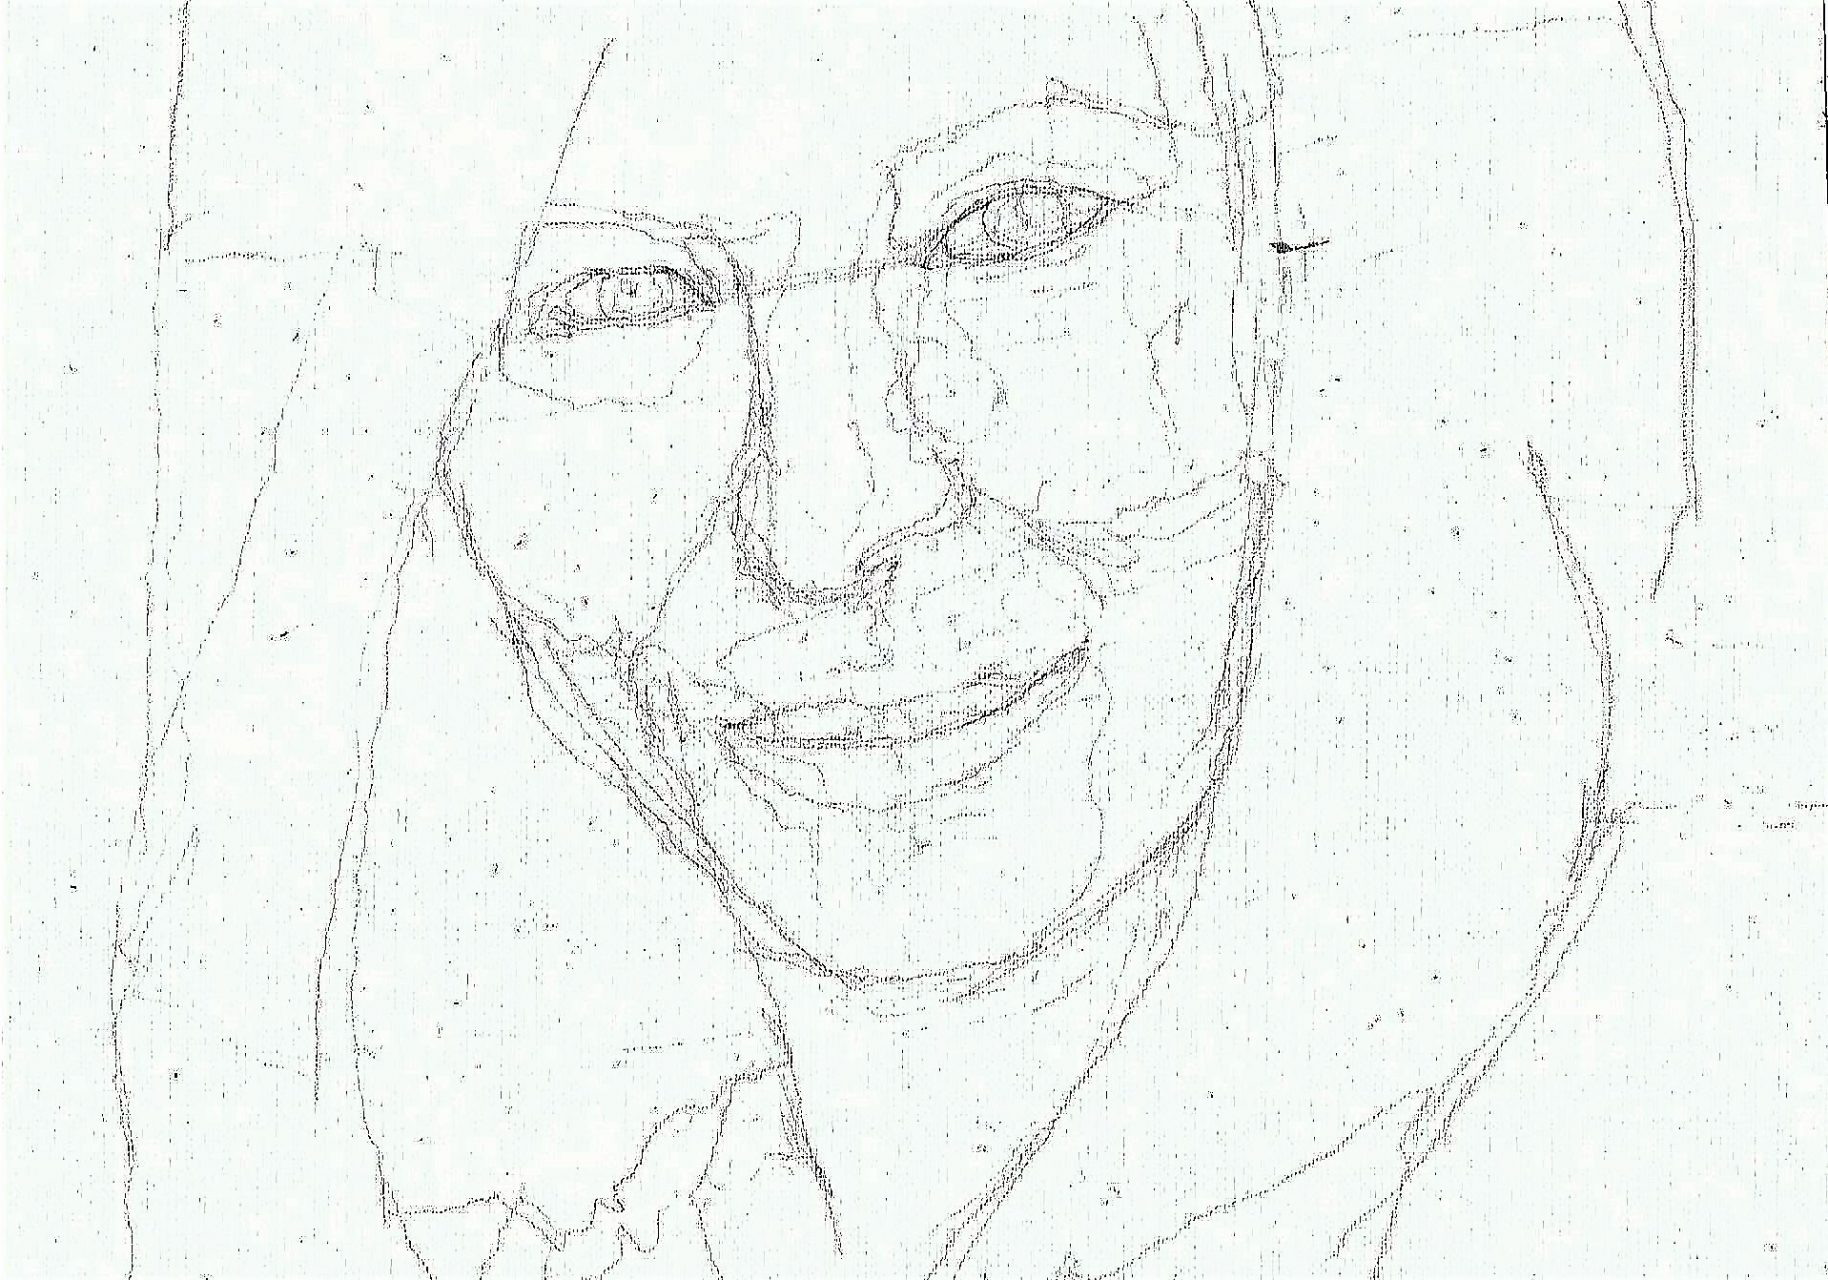 365 dagen een portret 85 Barbara Streisand, zangeres Potlood 19c25